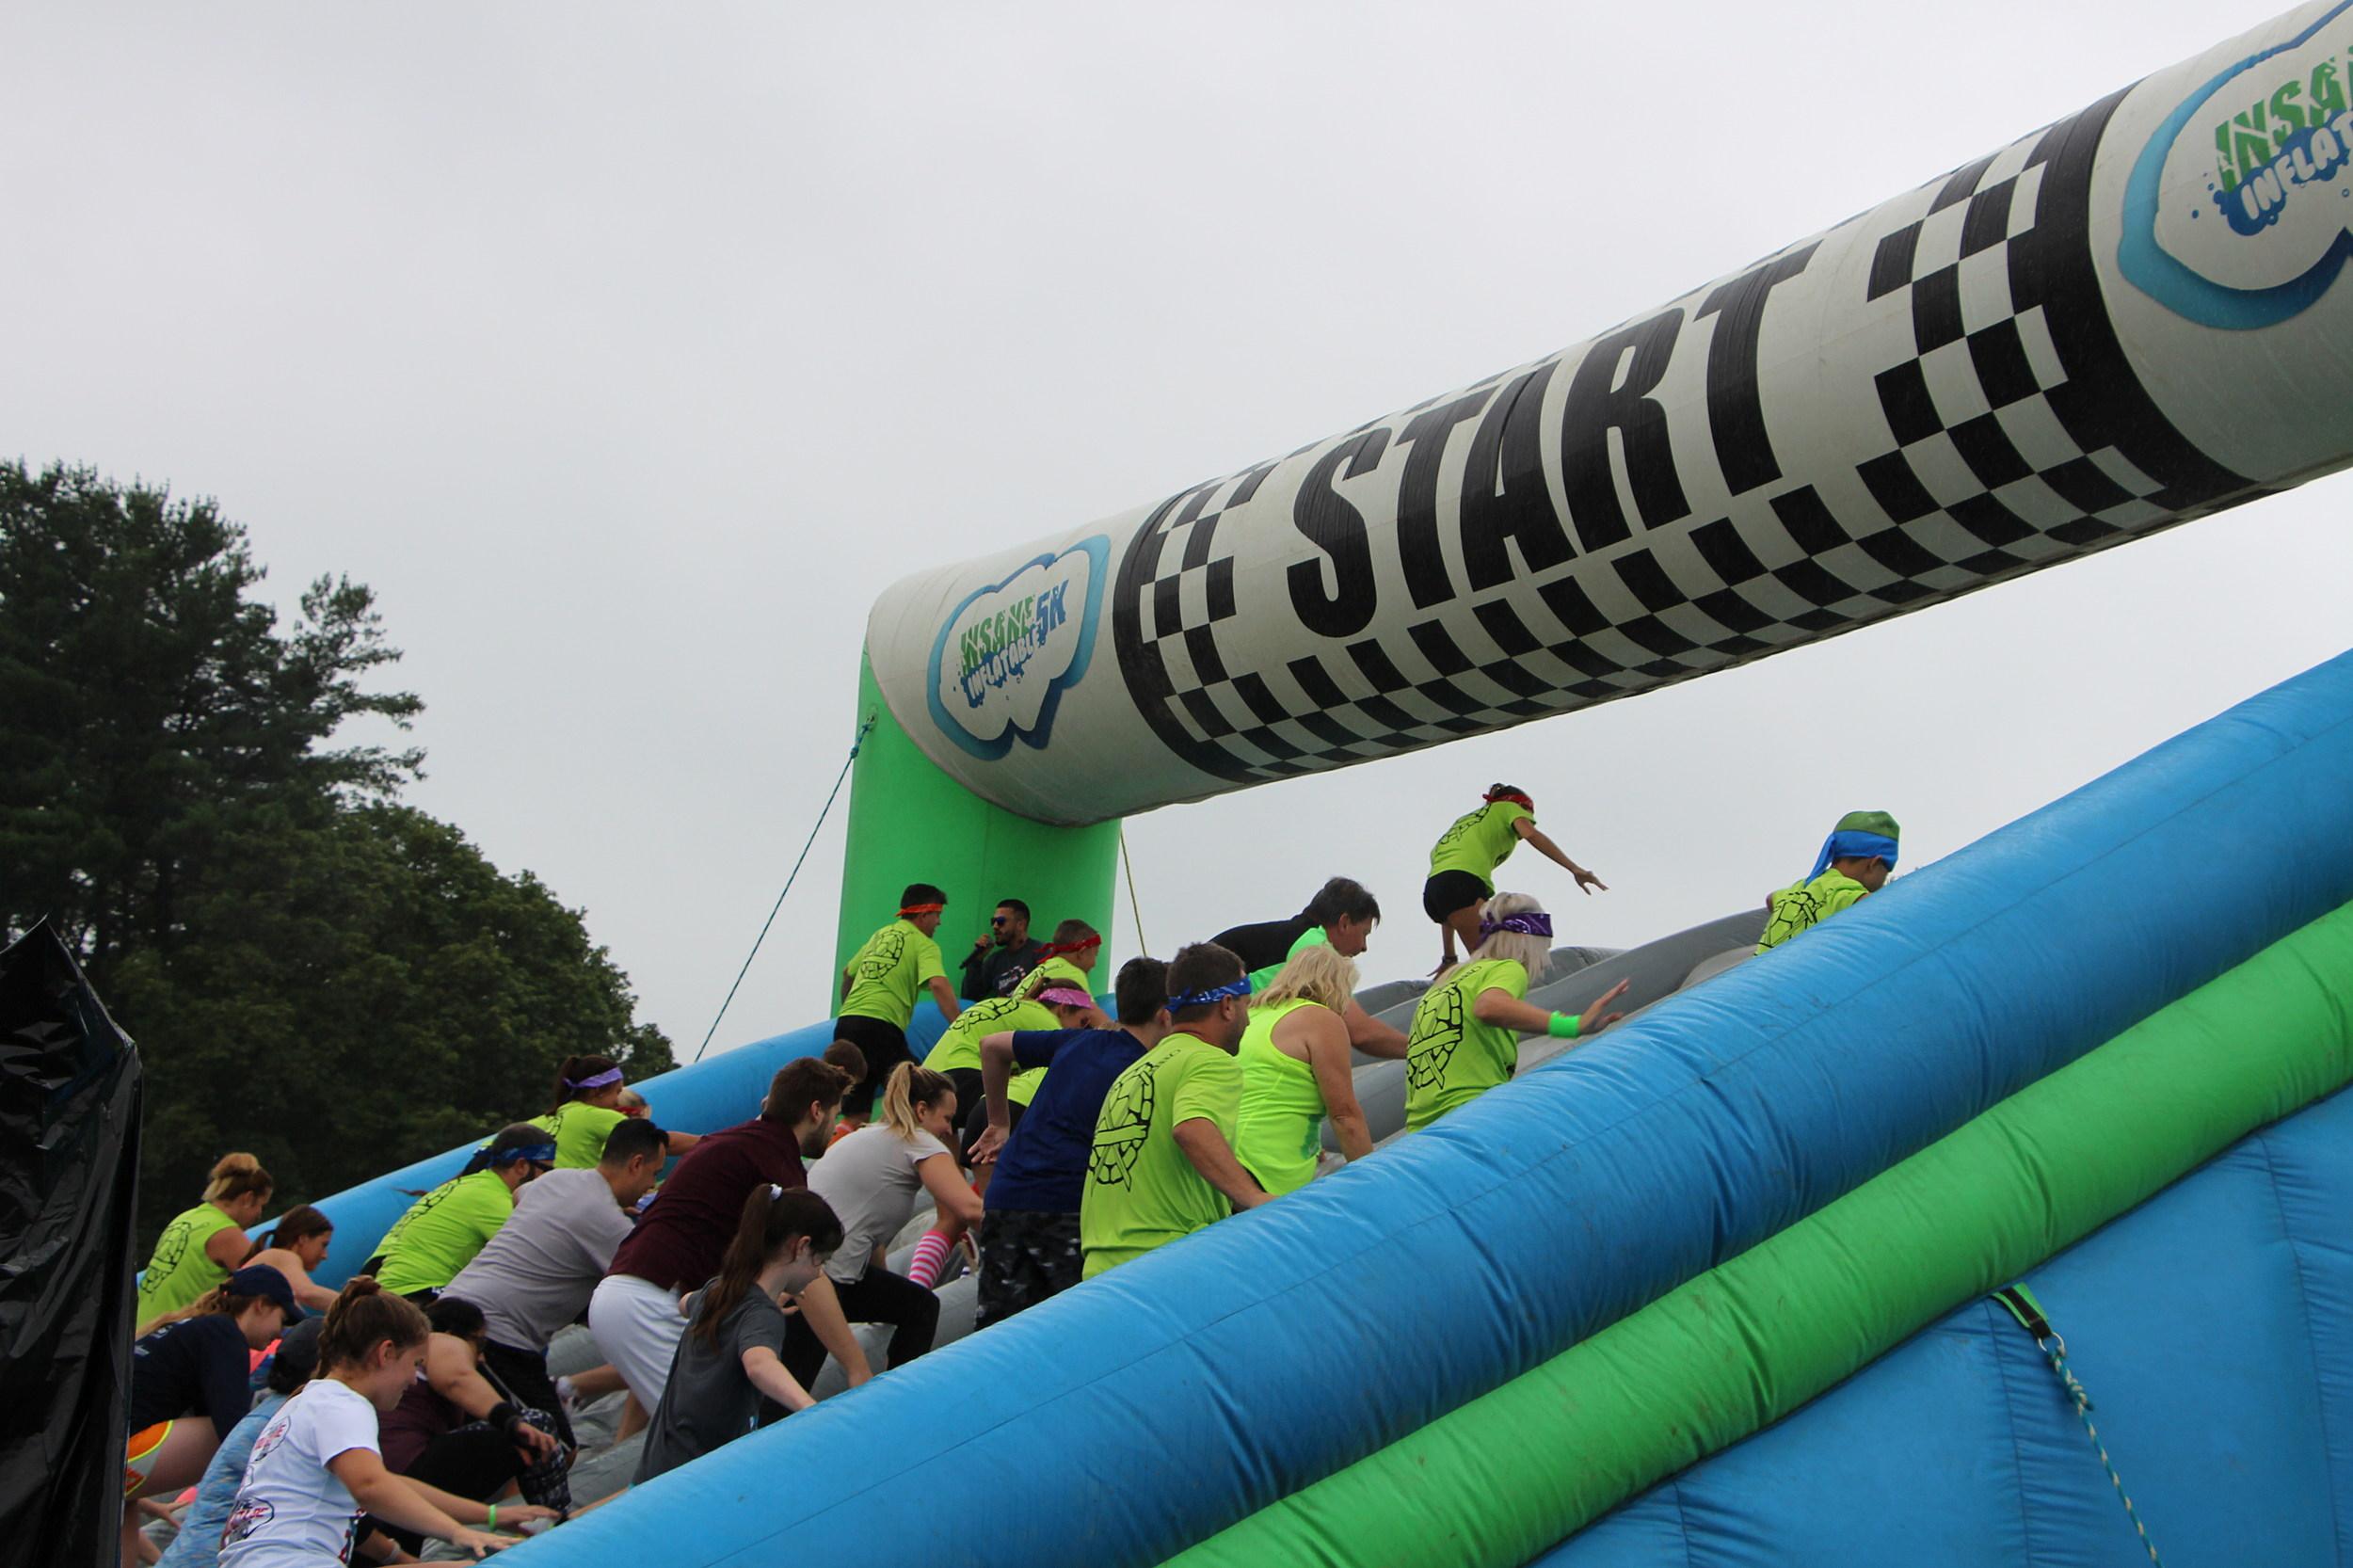 Insane Inflatable Promo Code Buffalo